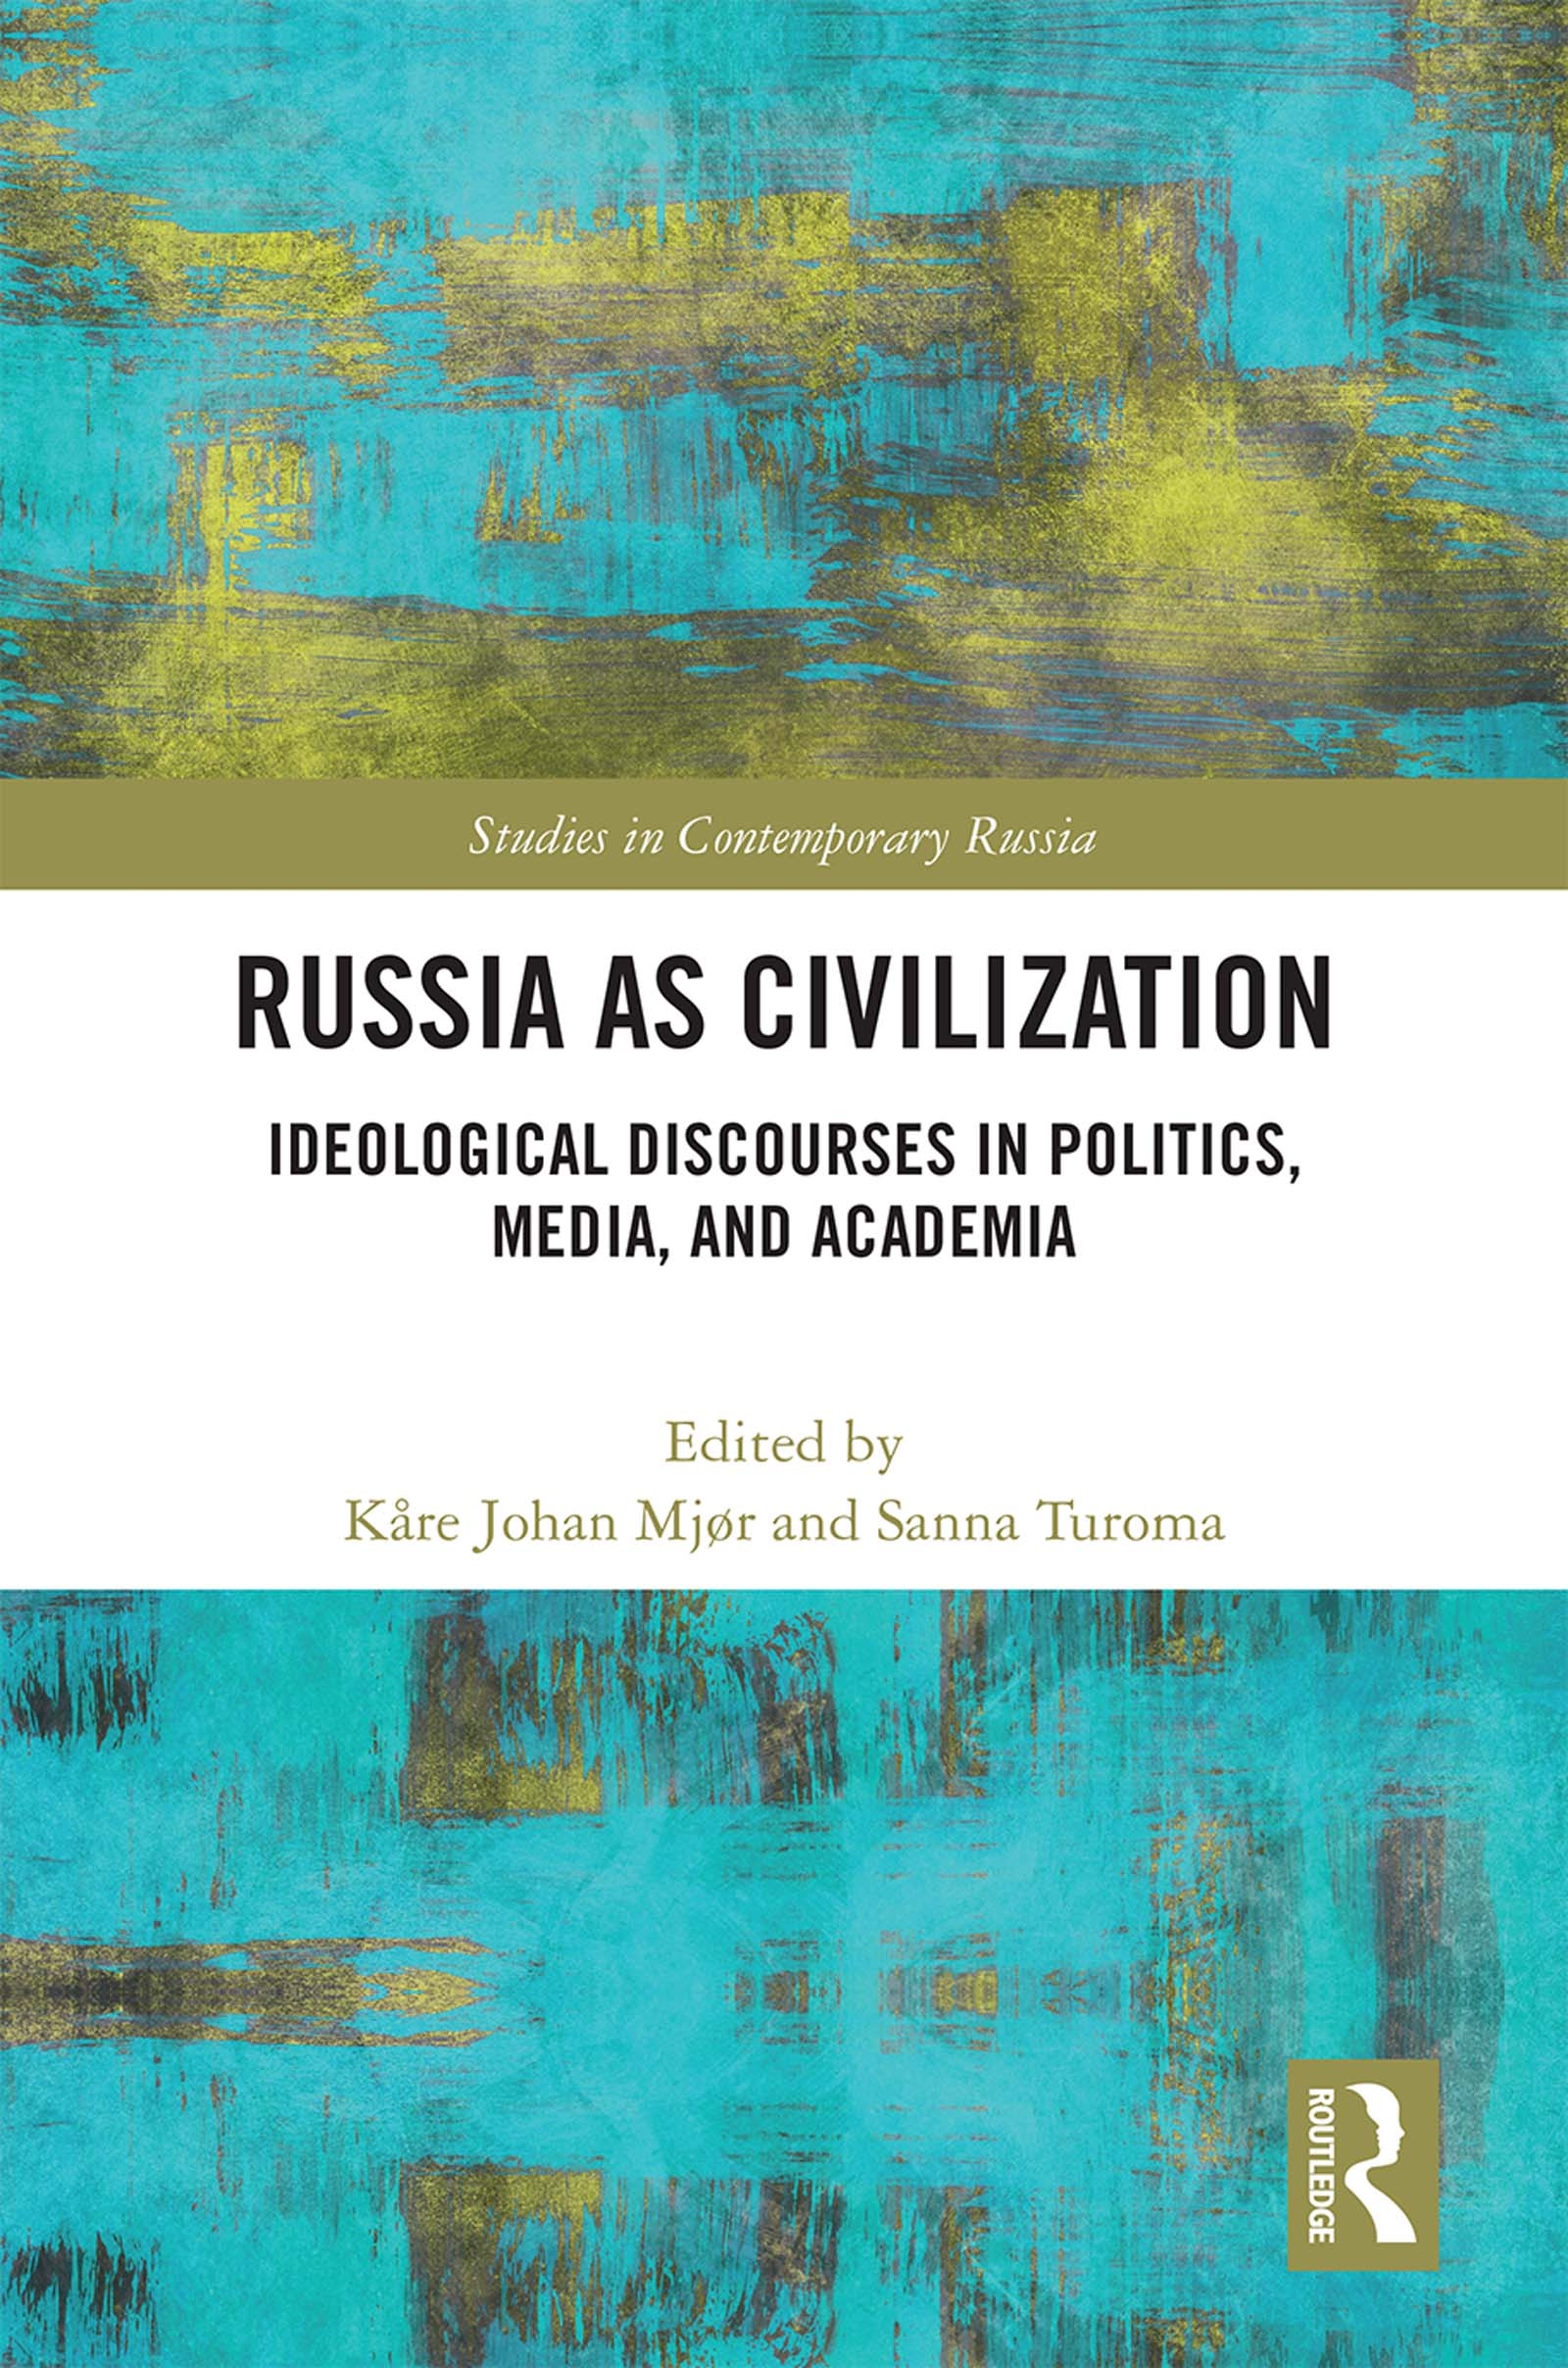 Russia as Civilization